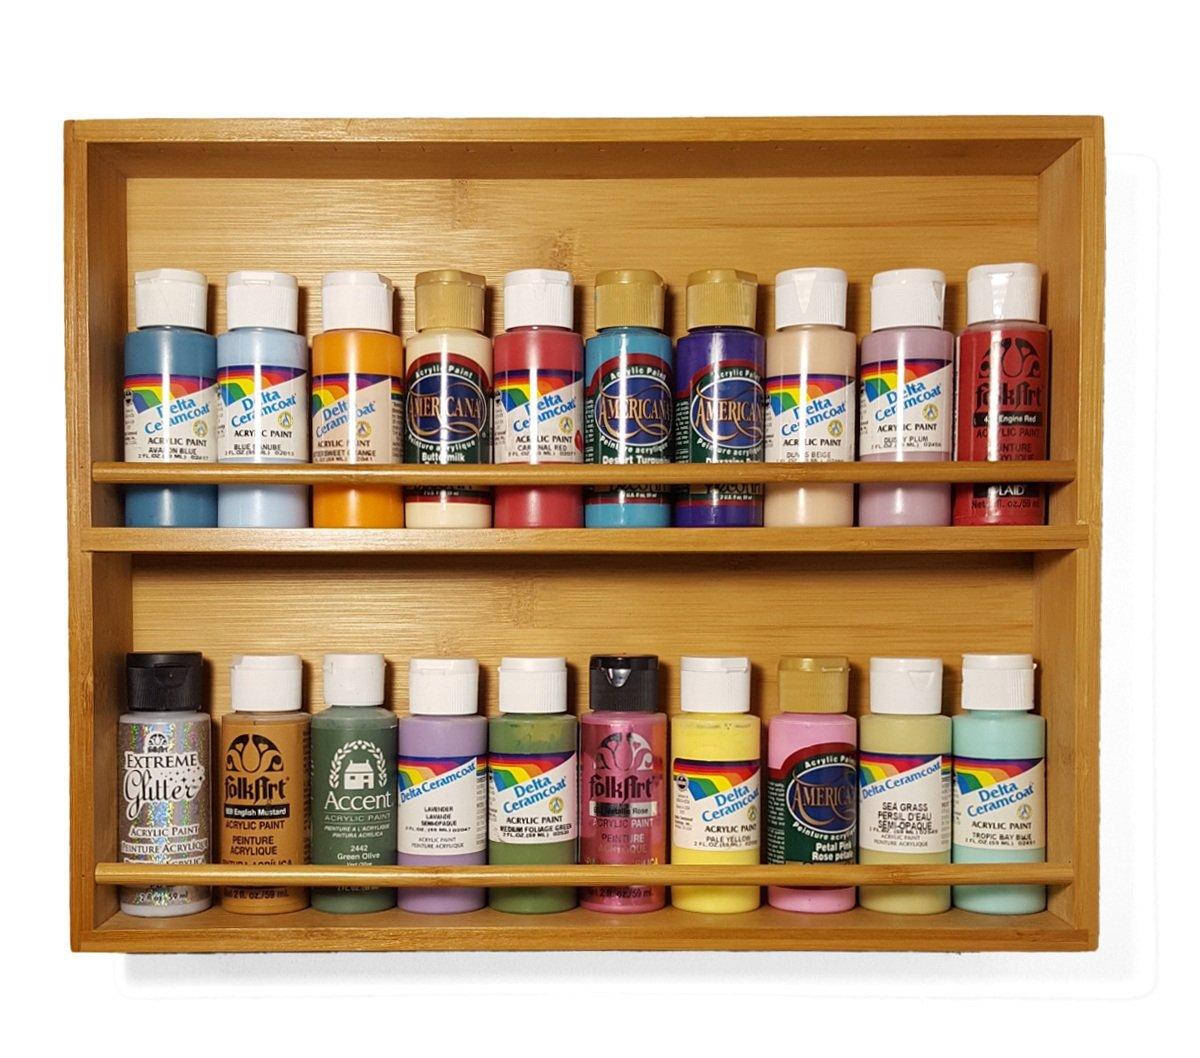 Amazon.com: Craft acrylic paint storage rack, solid wood shelf ...